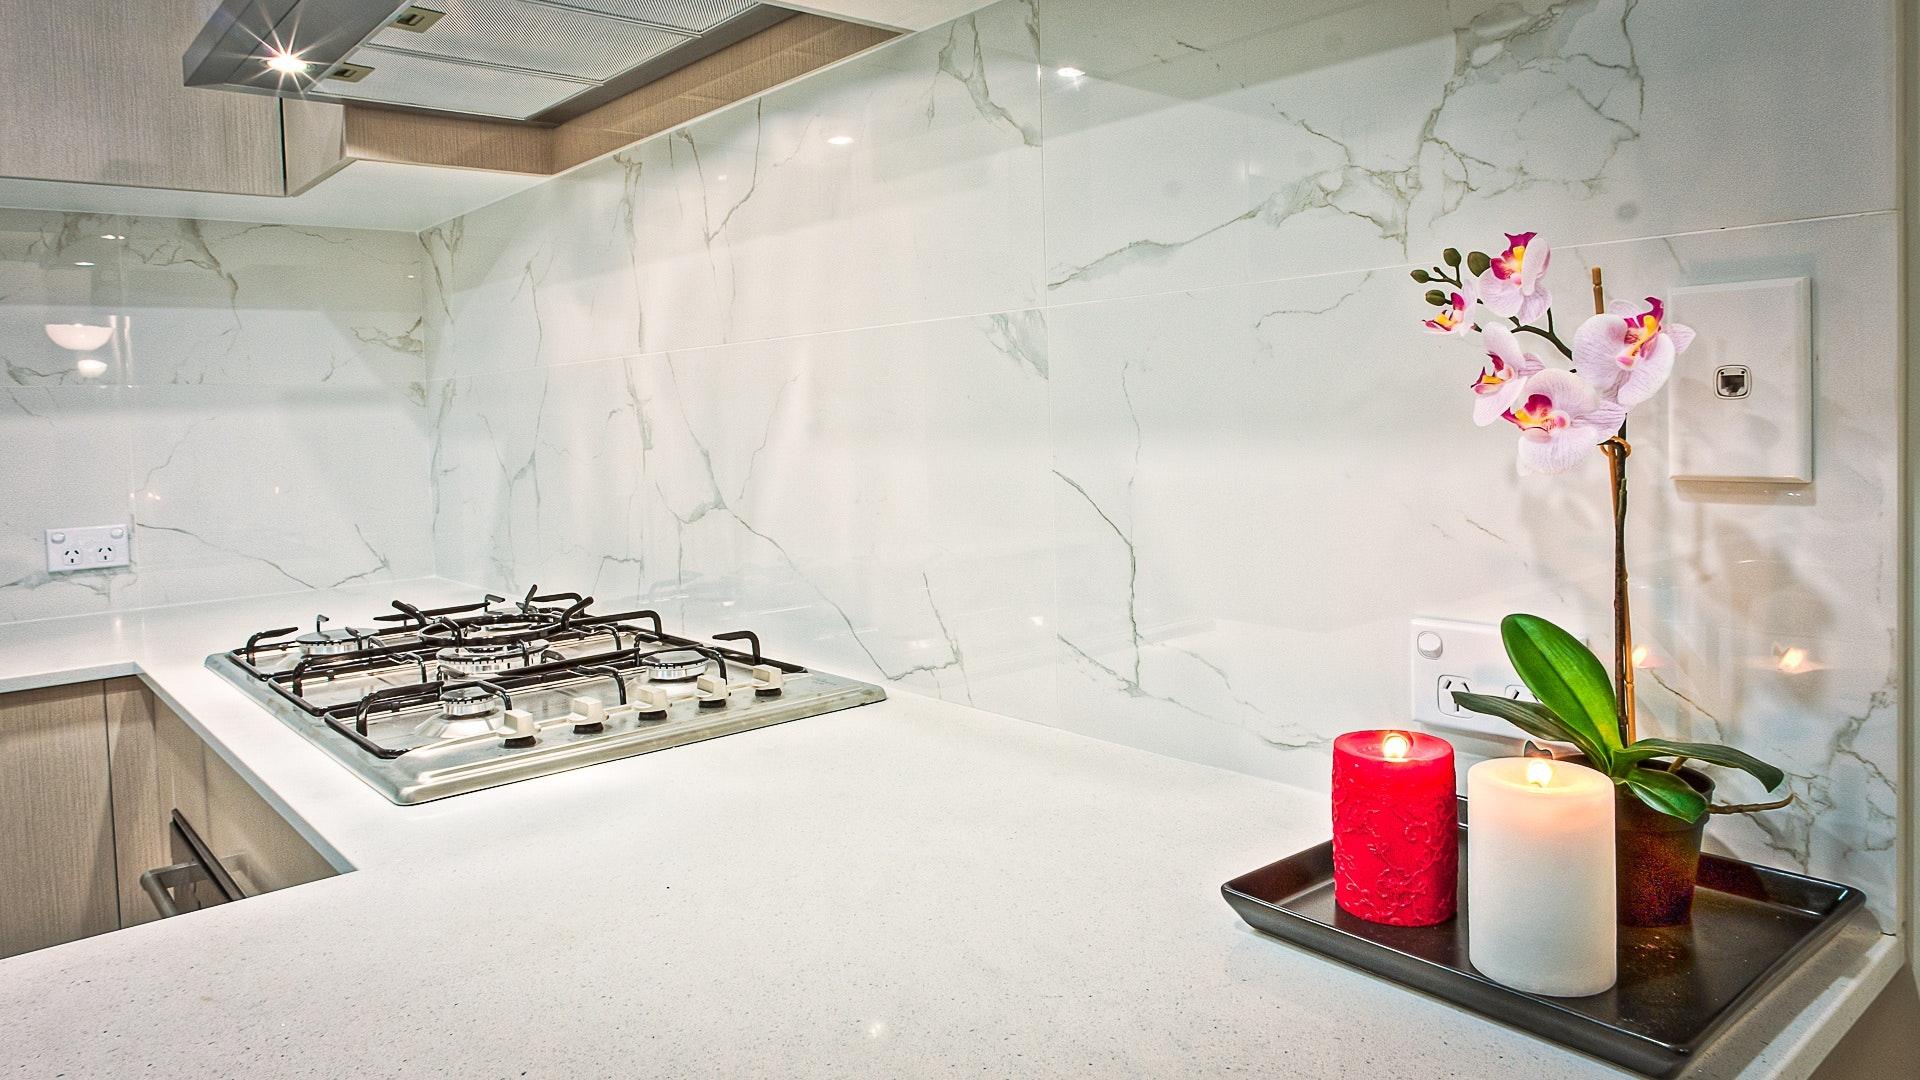 Spieki kwarcowe Laminam, Kerlite - Blat kuchenny z konglomeratu